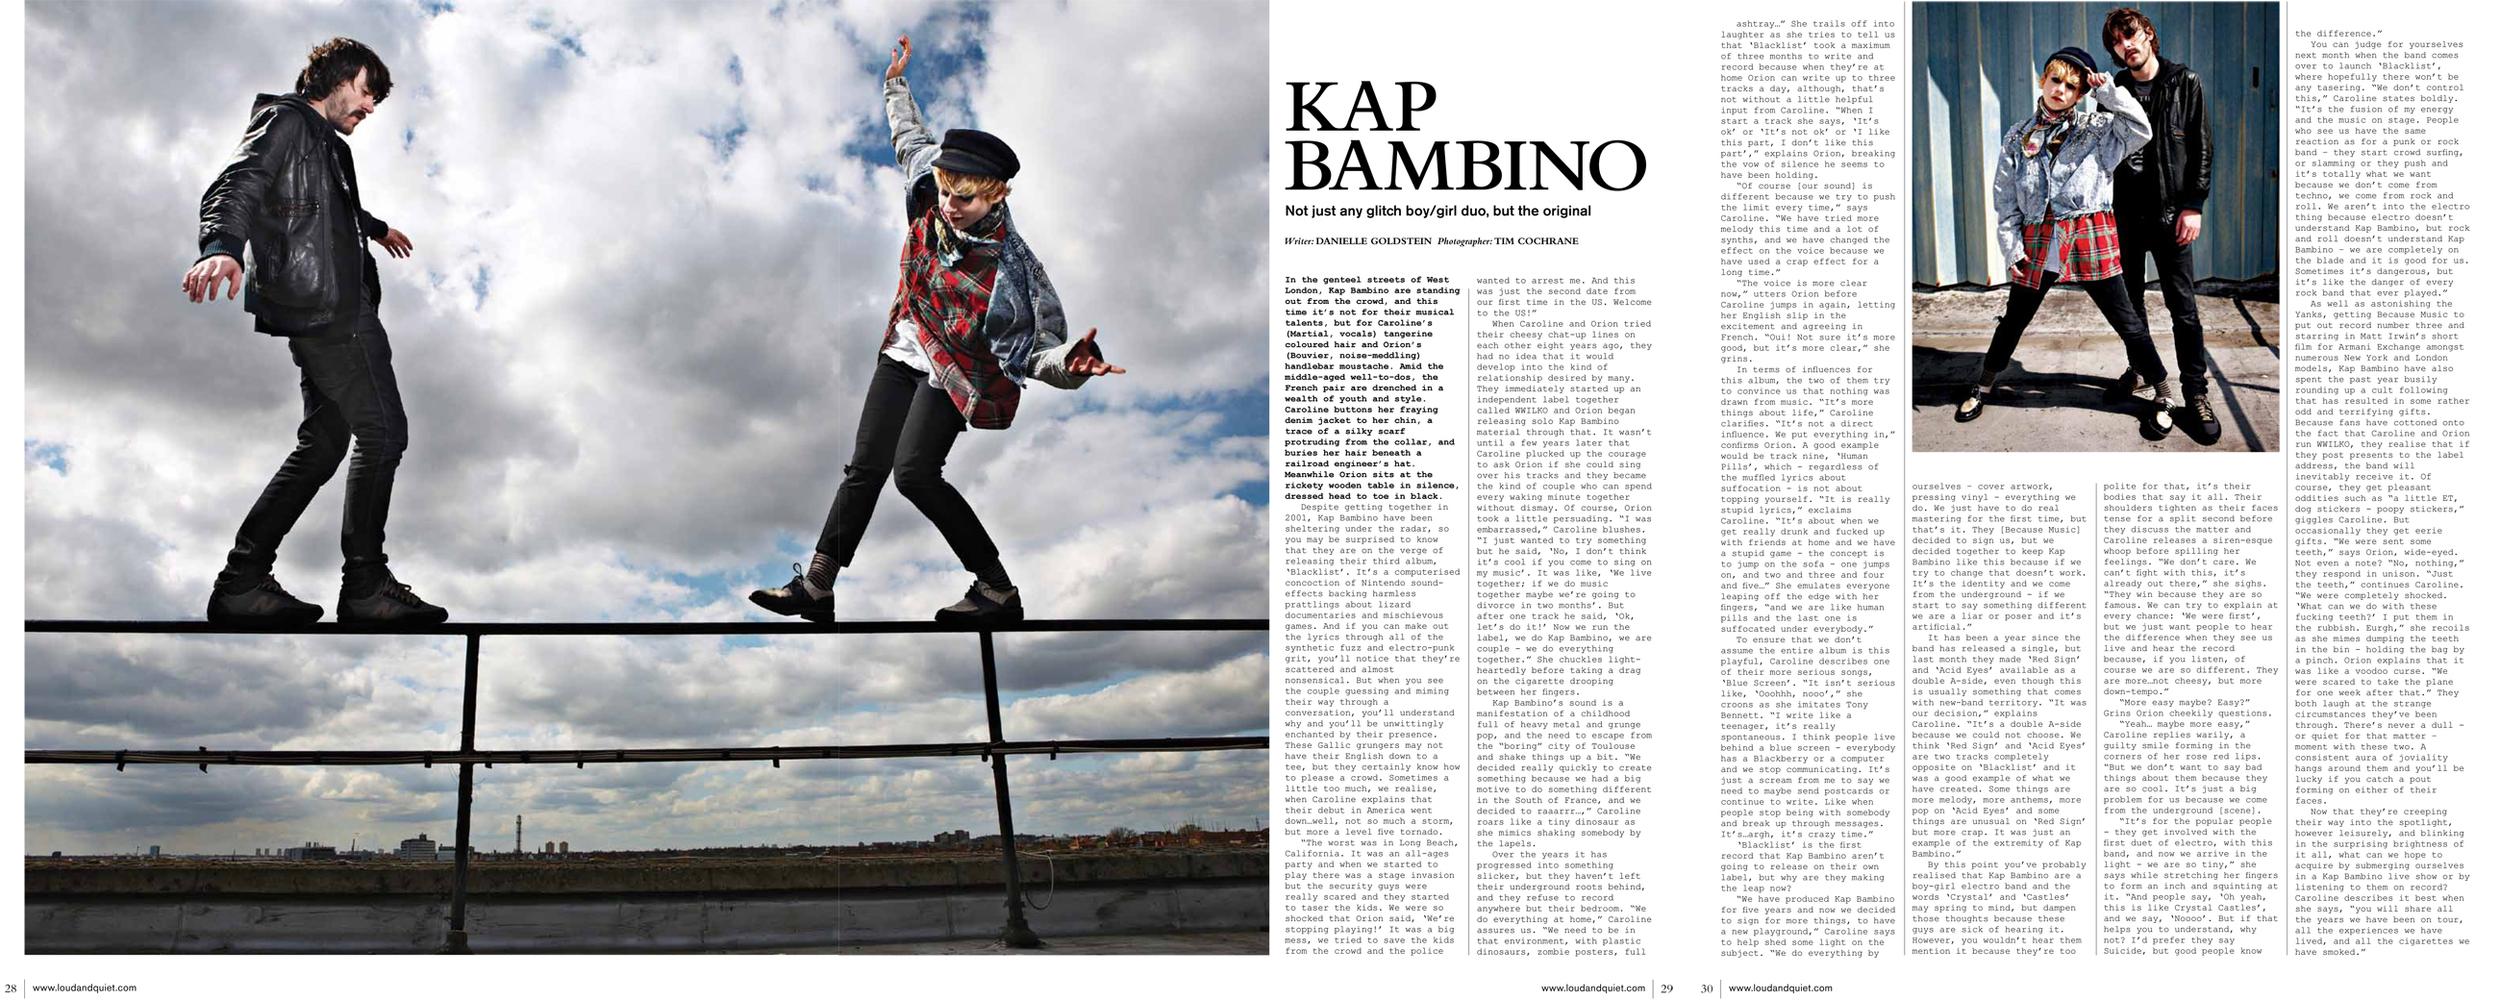 LnQ_Kap Bambino_28-30.jpg